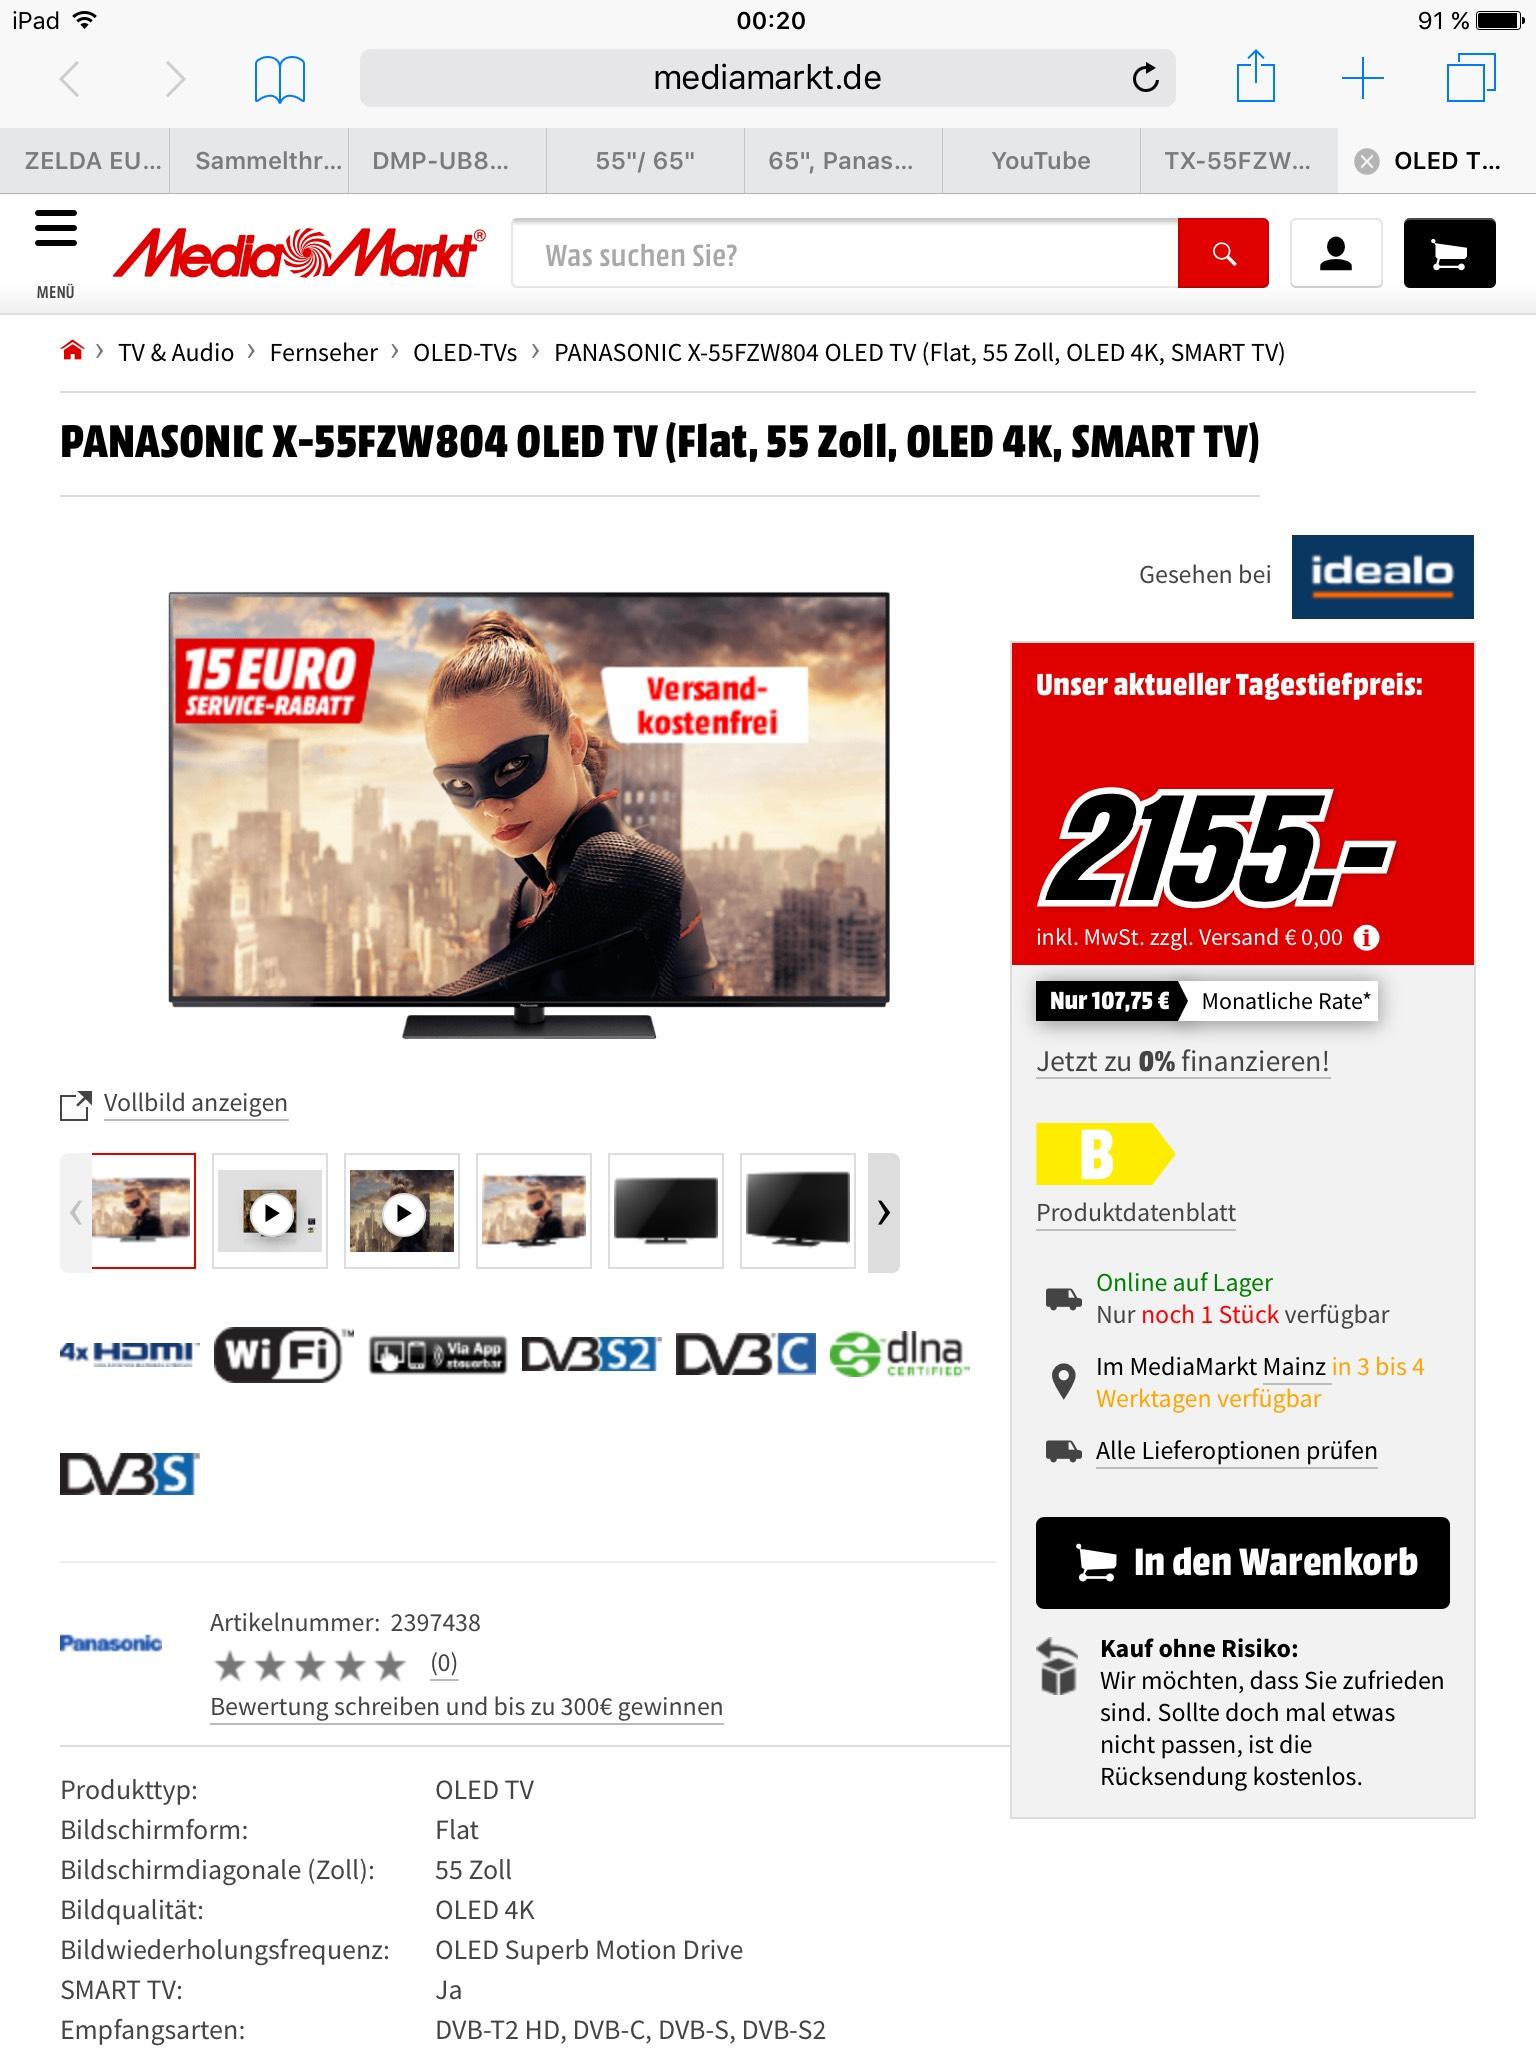 Mediamarkt/Saturn Panasonic Fzw804 Oled Tv